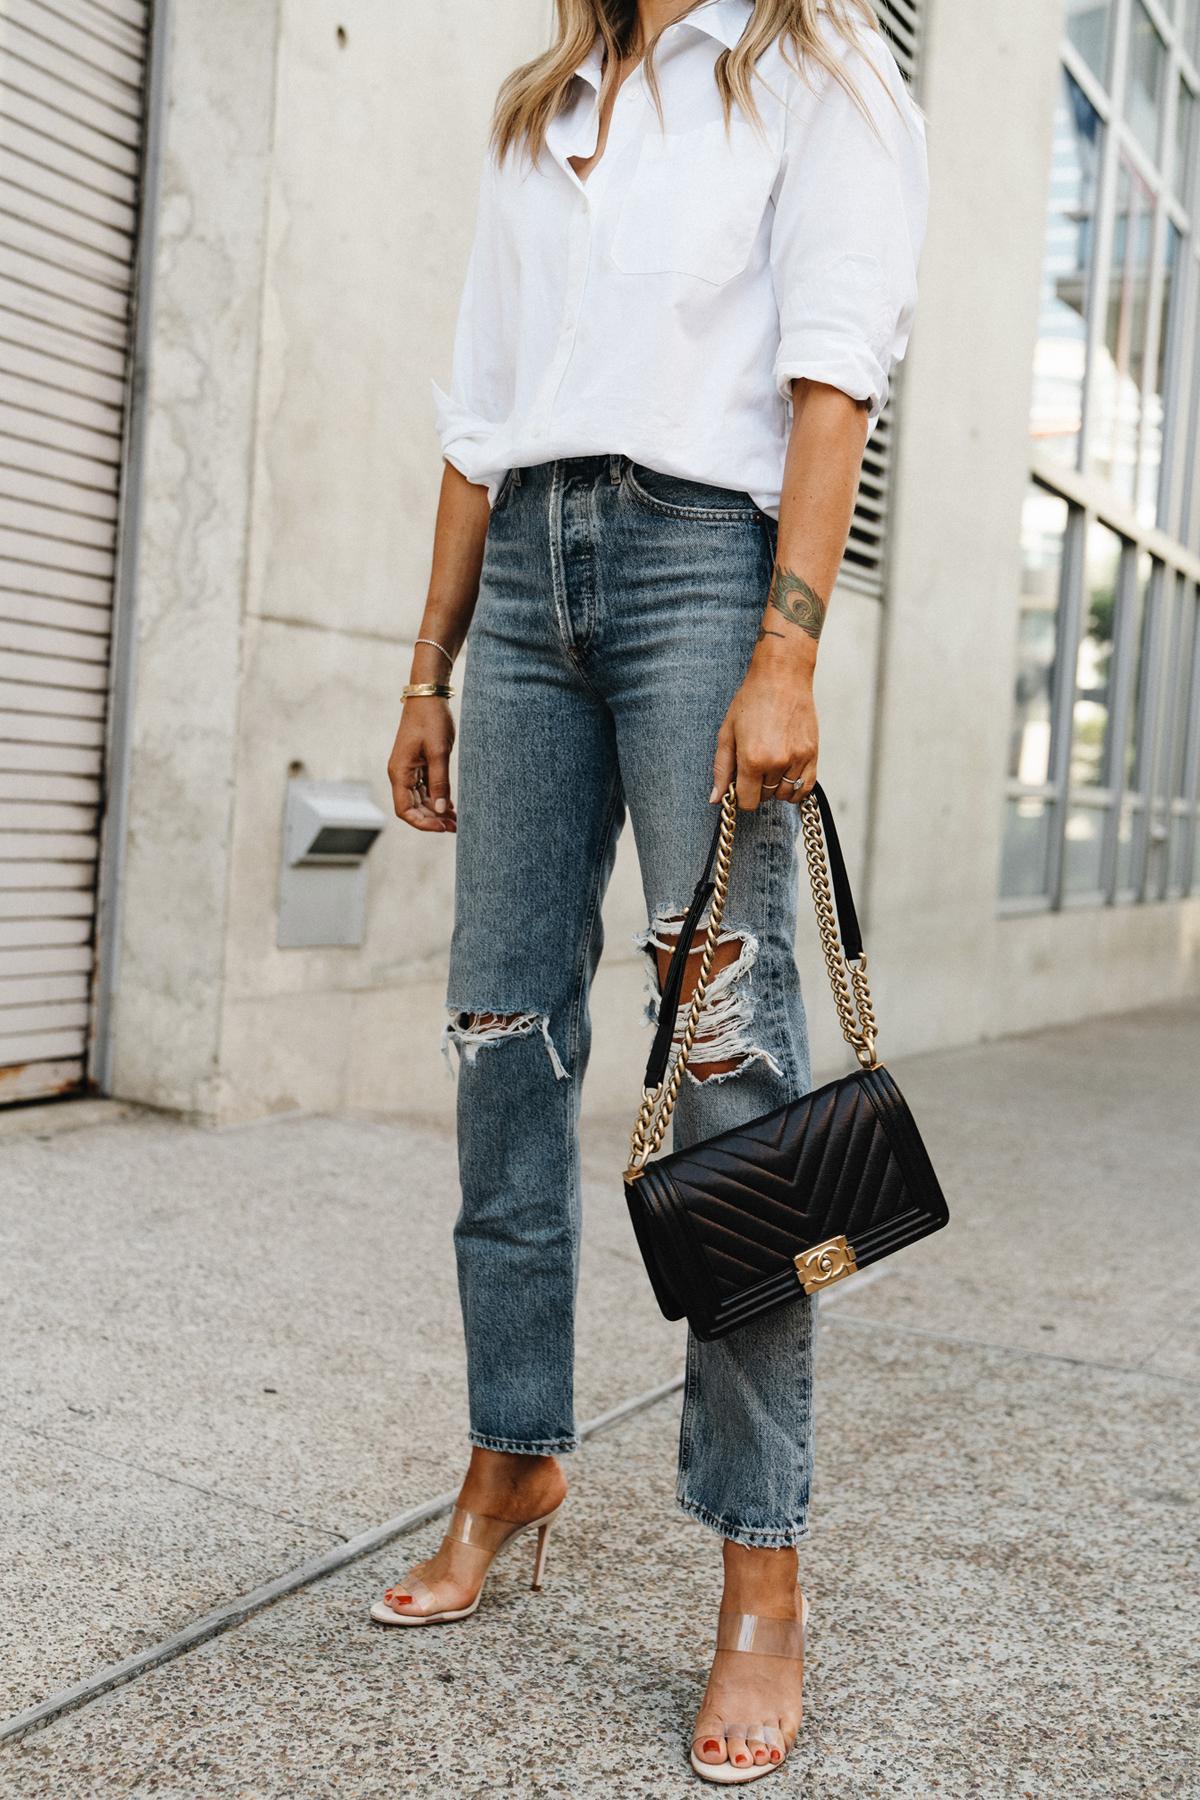 Fashion Jackson Wearing Jenni Kayne White Button Up Shirt AGOLDE Ripped Jeans Chanel Black Boy Bag Schutz Clear Heeled Sandals